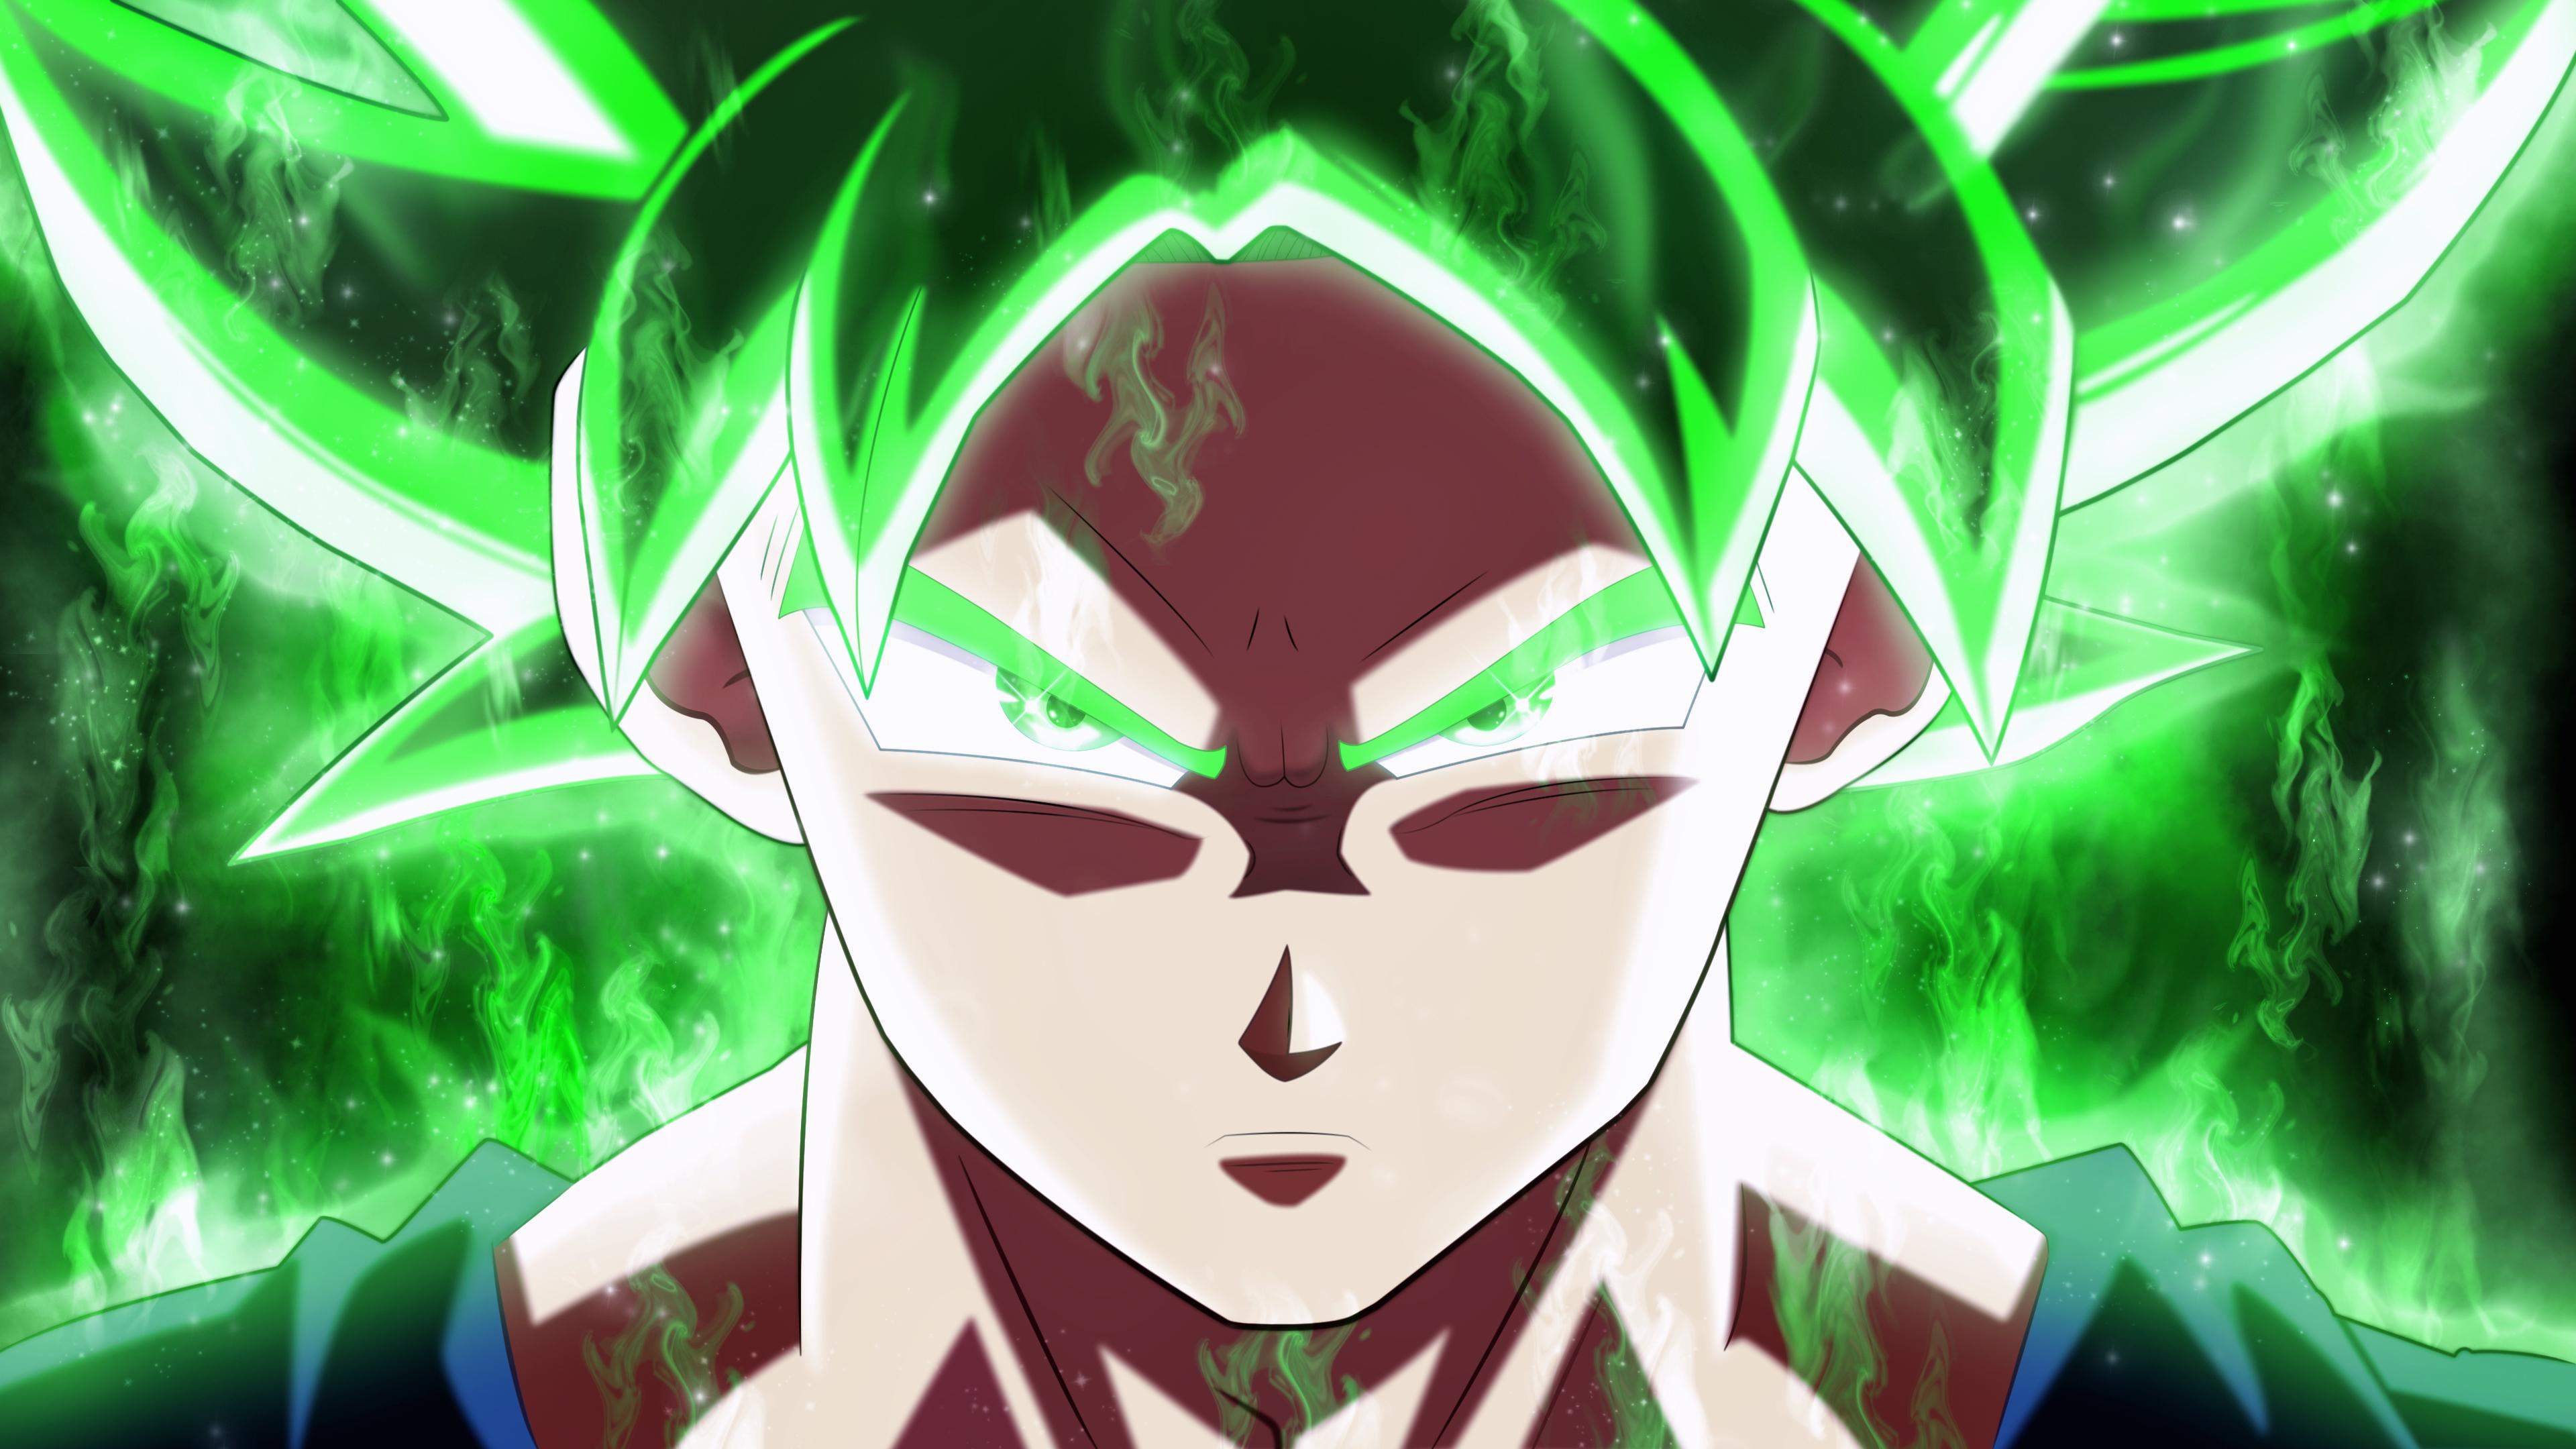 Fond d'écran : Dragon Ball Super, Son Goku, Super Saiyan, Coloré, Dragon Ball 3840x2160 ...